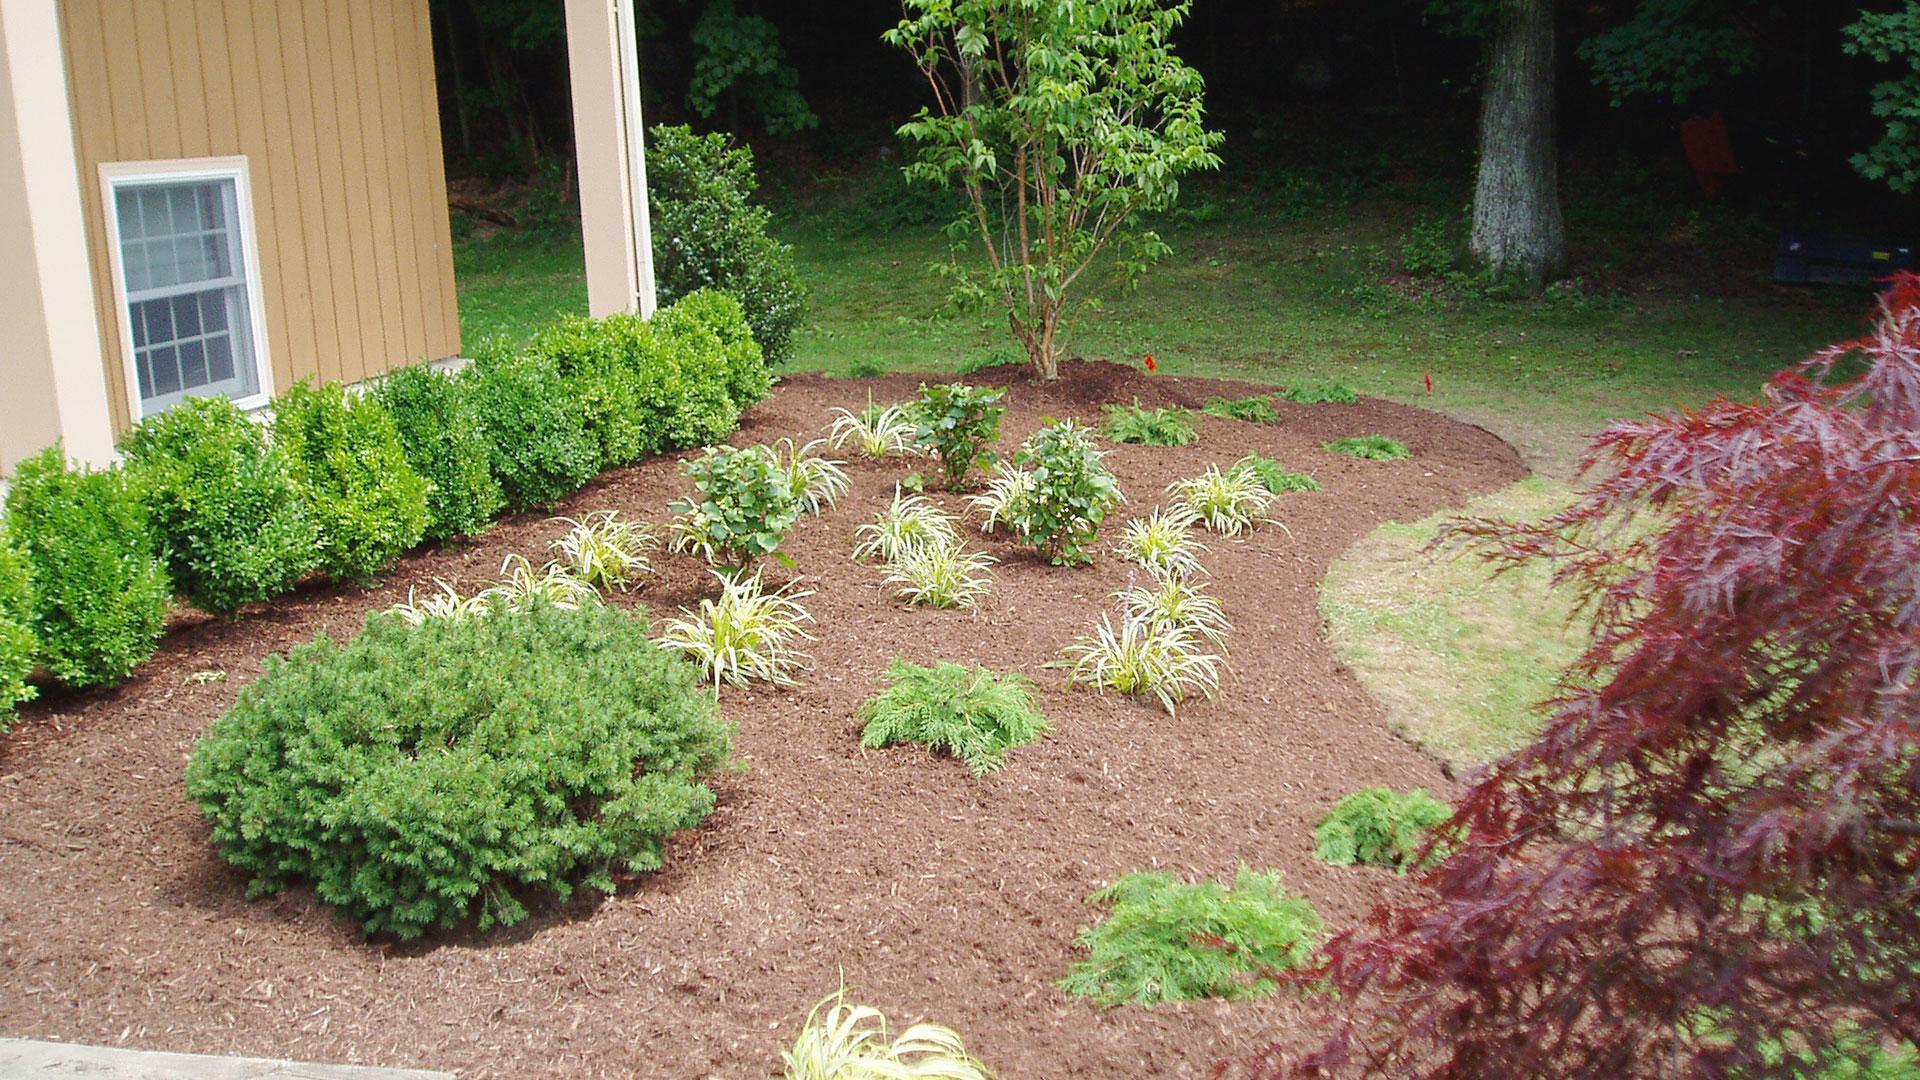 Foundation plantings land designs unlimited llc for Garden design 1920 s